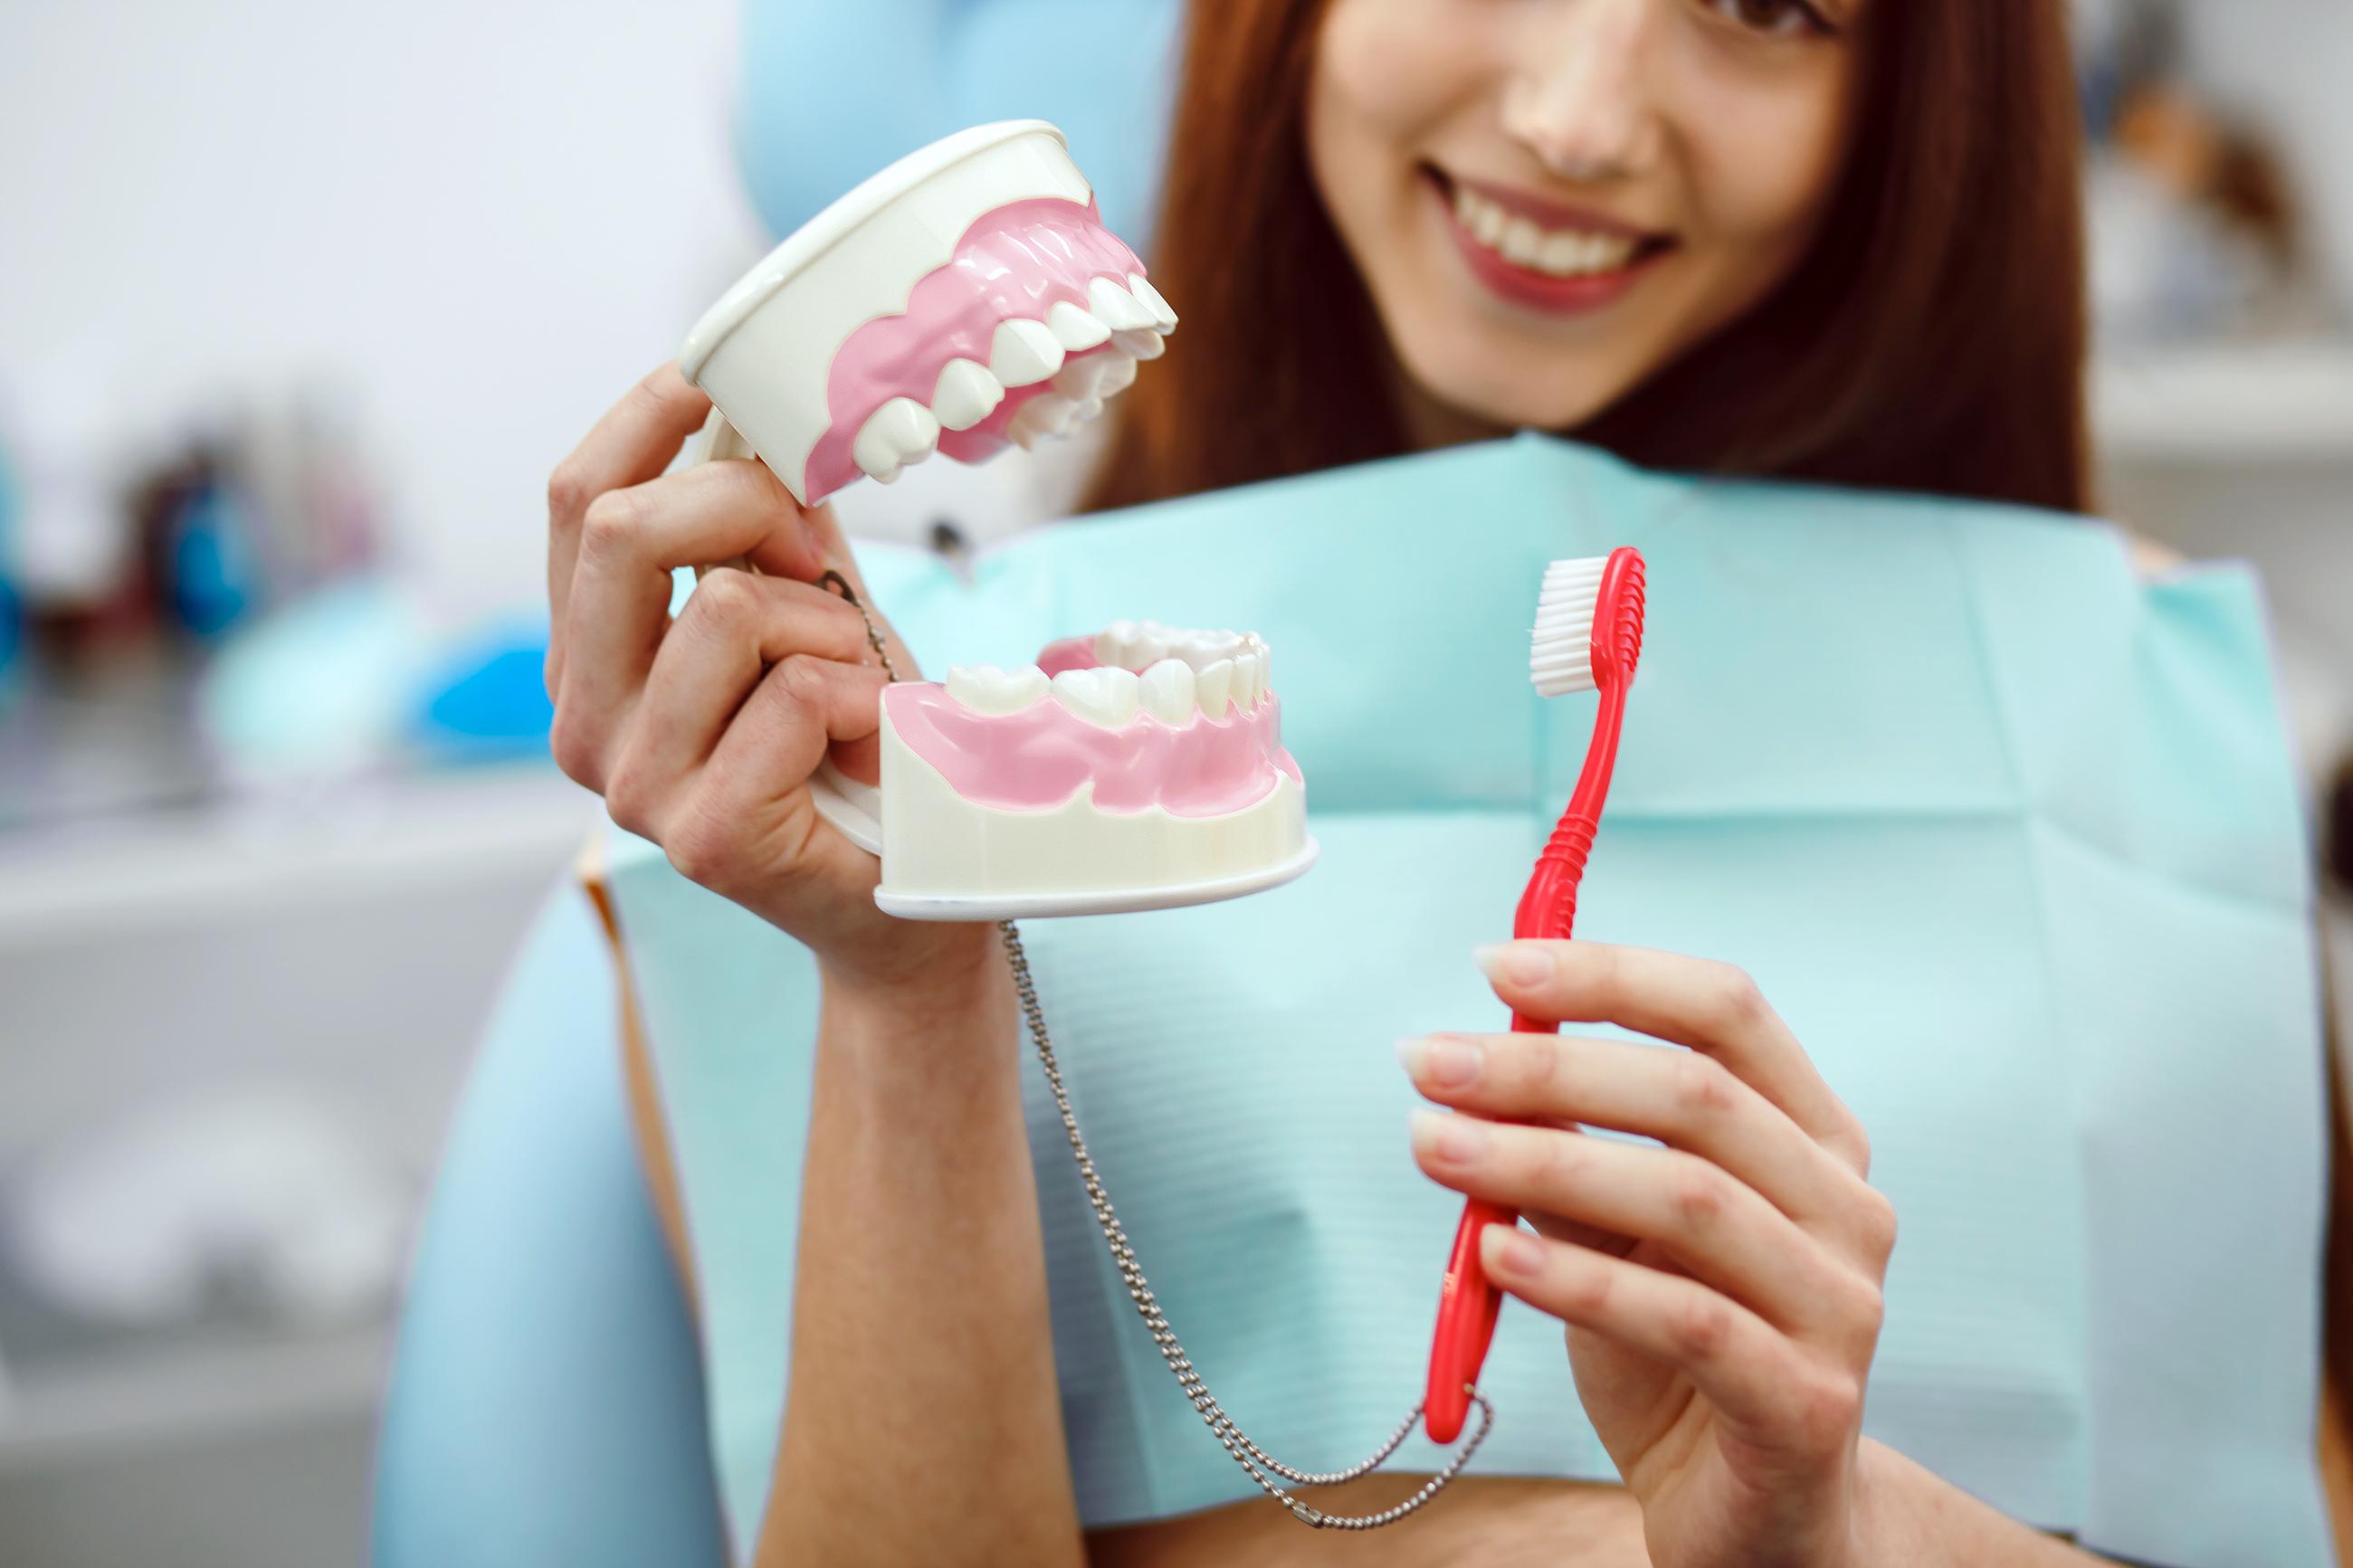 Стоматология: профилактика и гигиена